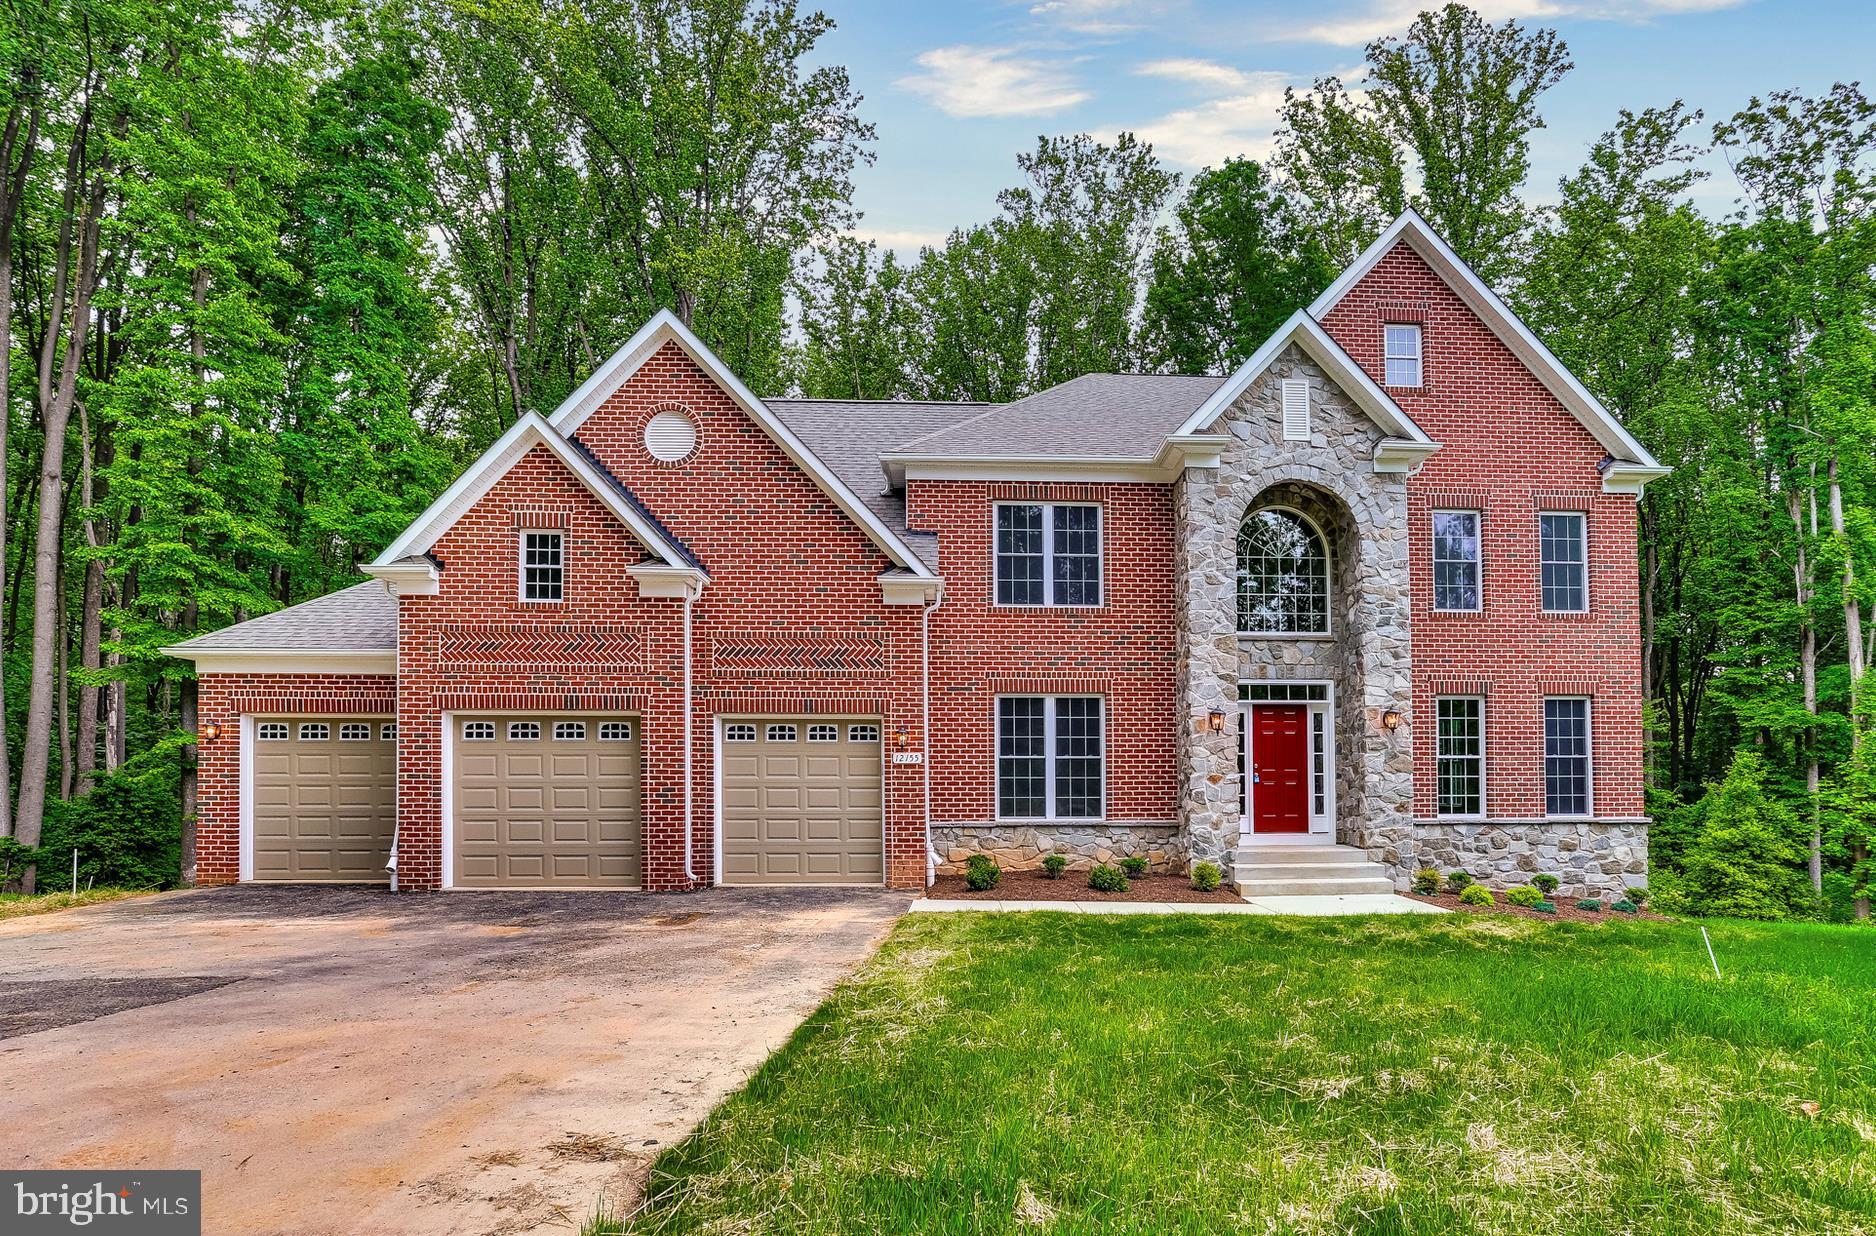 12155 Fulton Estates Ct, Fulton, MD, 20759